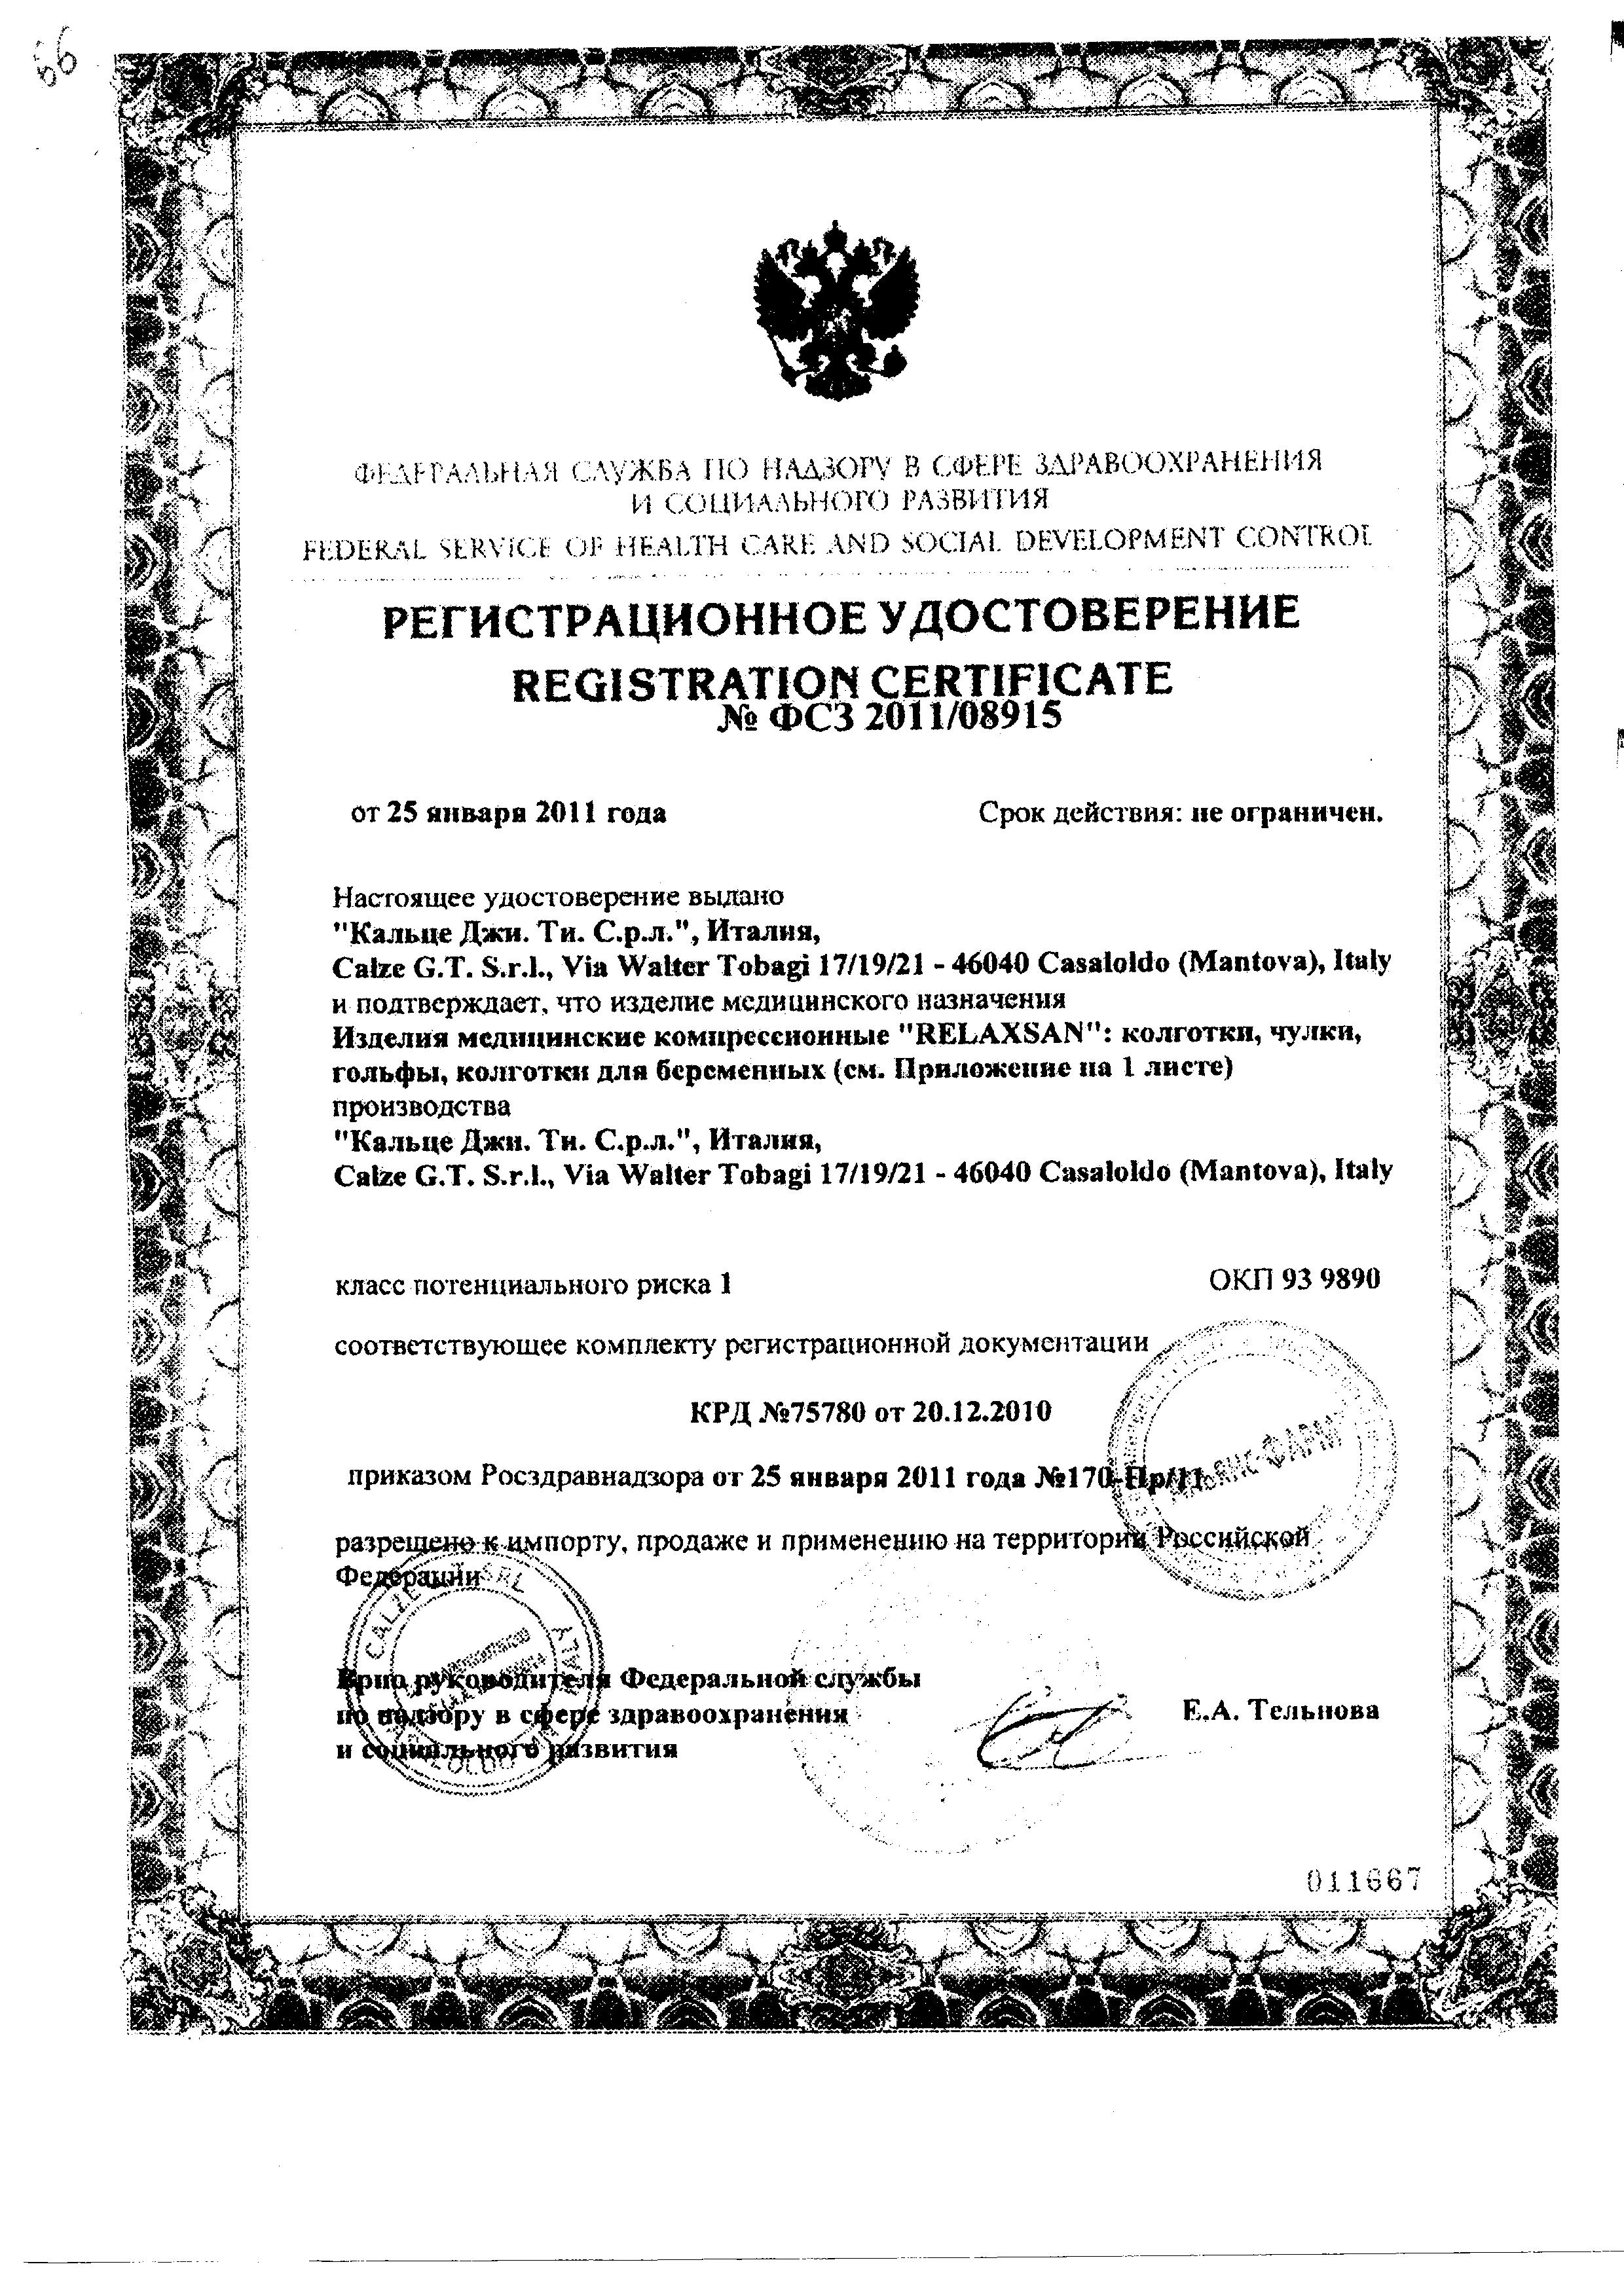 Relaxsan Collant Micro Колготки профилактика с микрофиброй сертификат